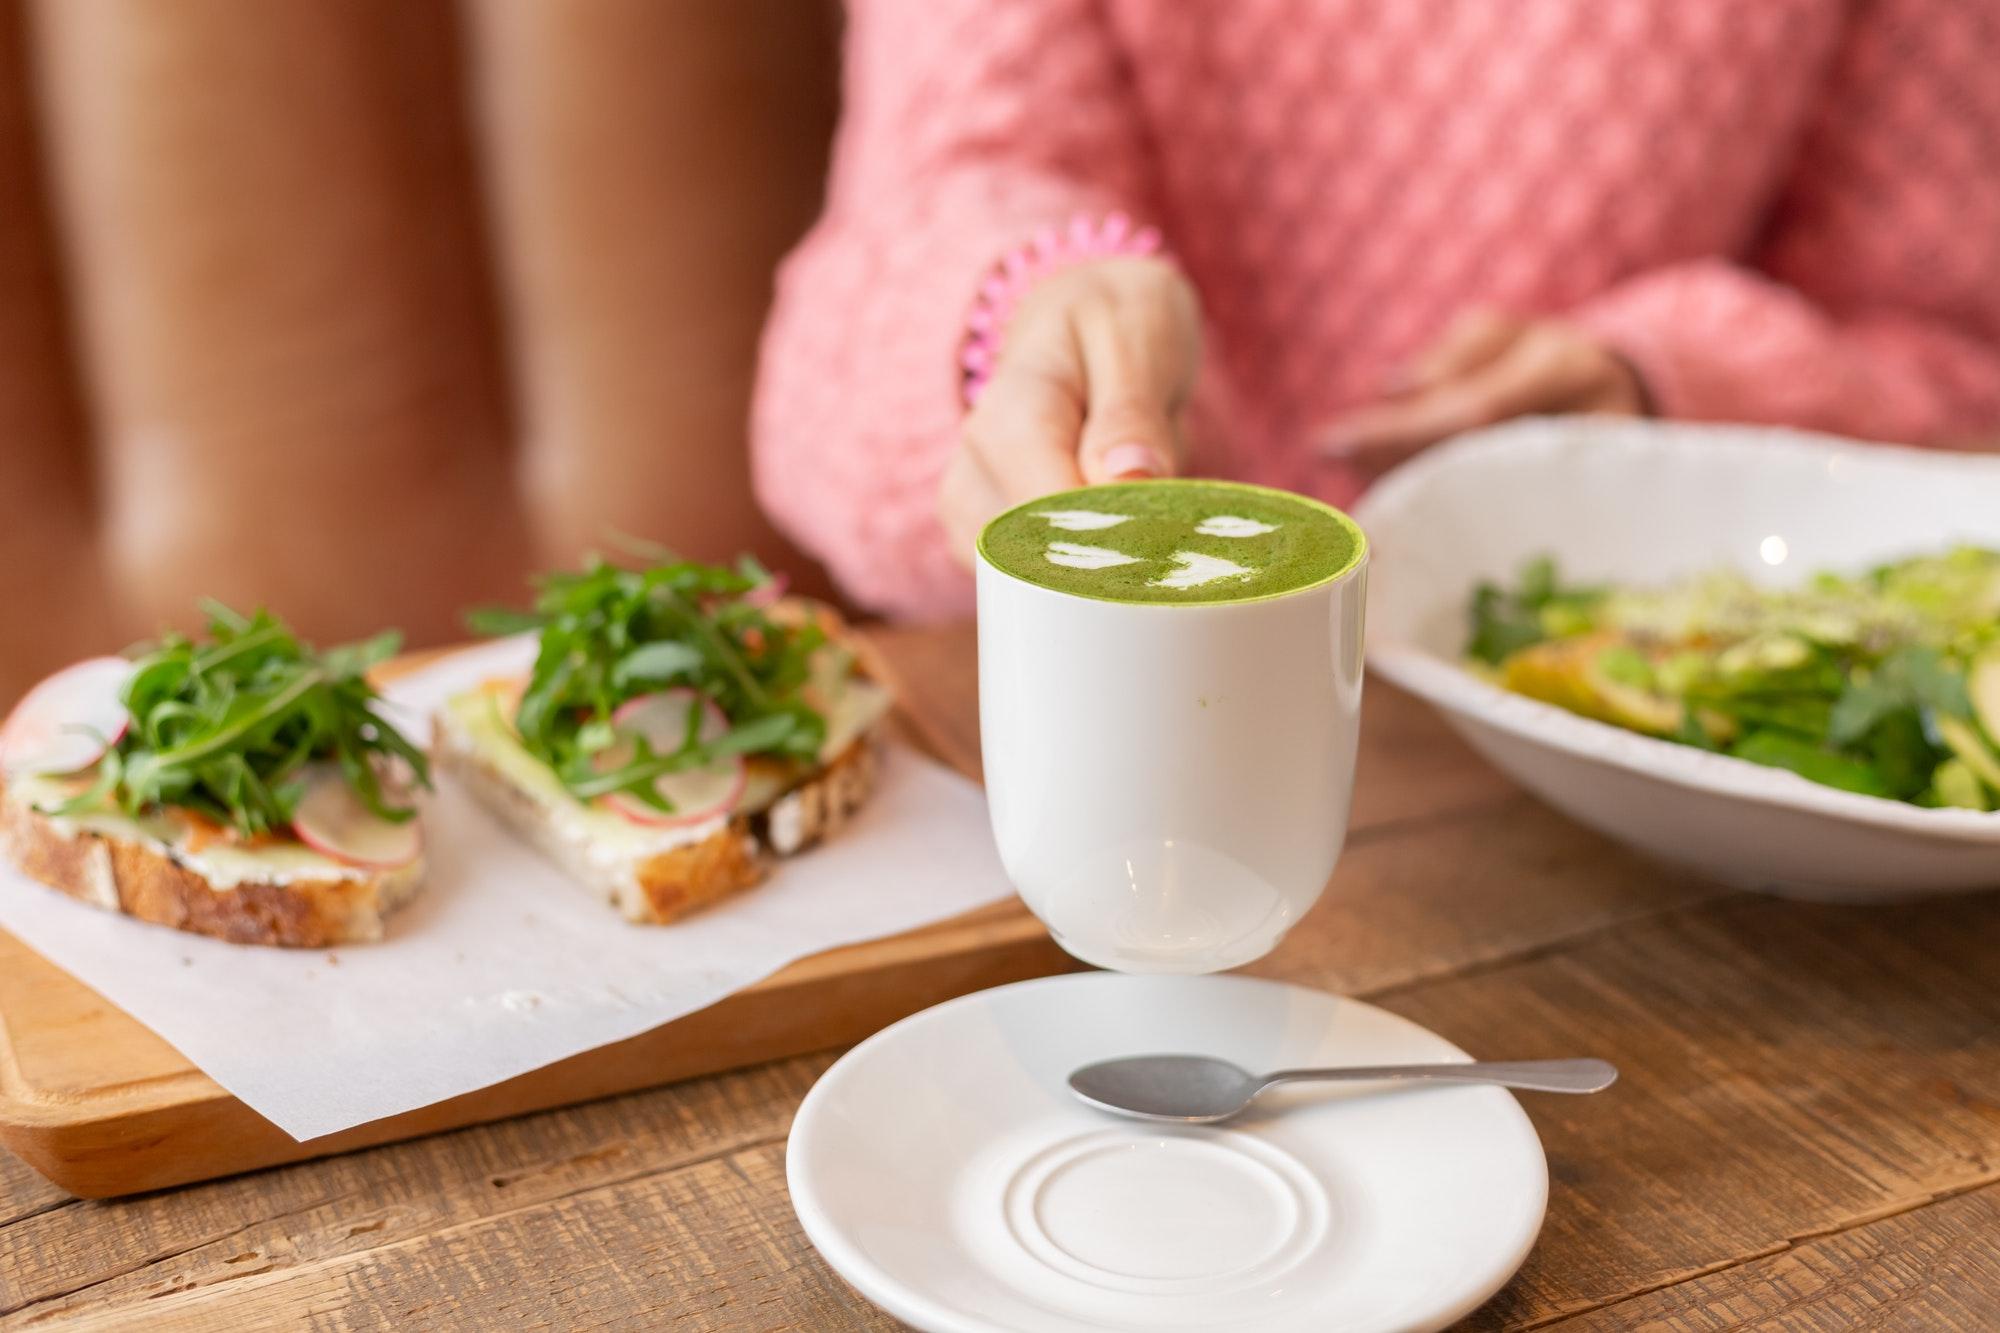 Healthy breakfast in the restaurant